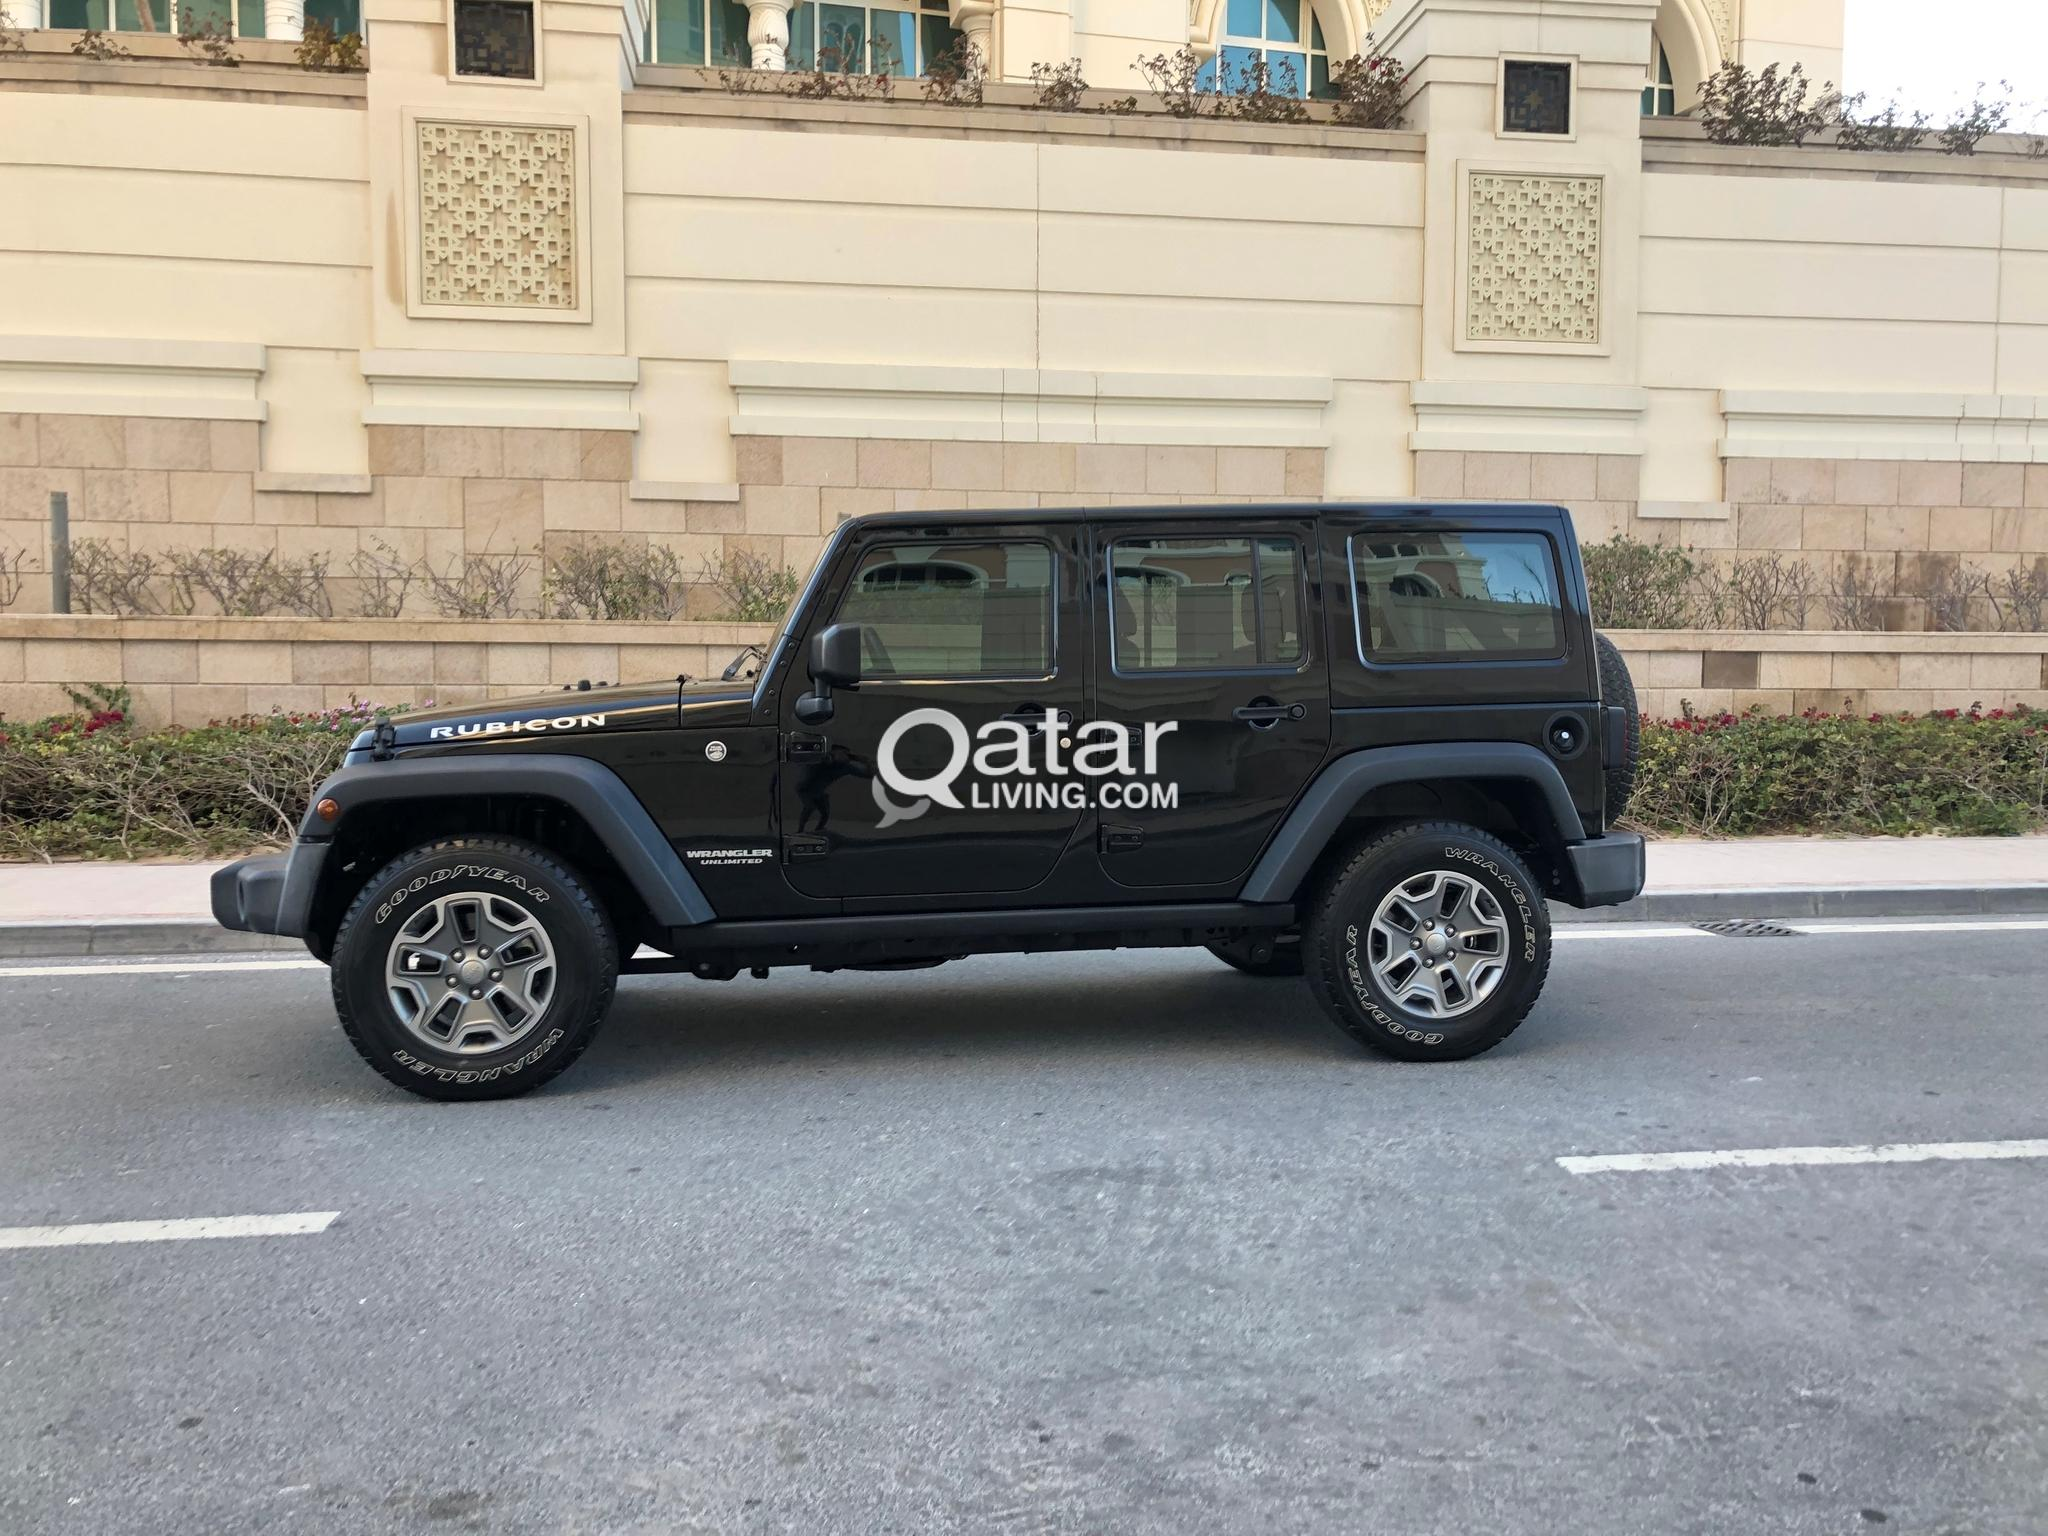 Jeep Wrangler Rubicon 2016 | Qatar Living